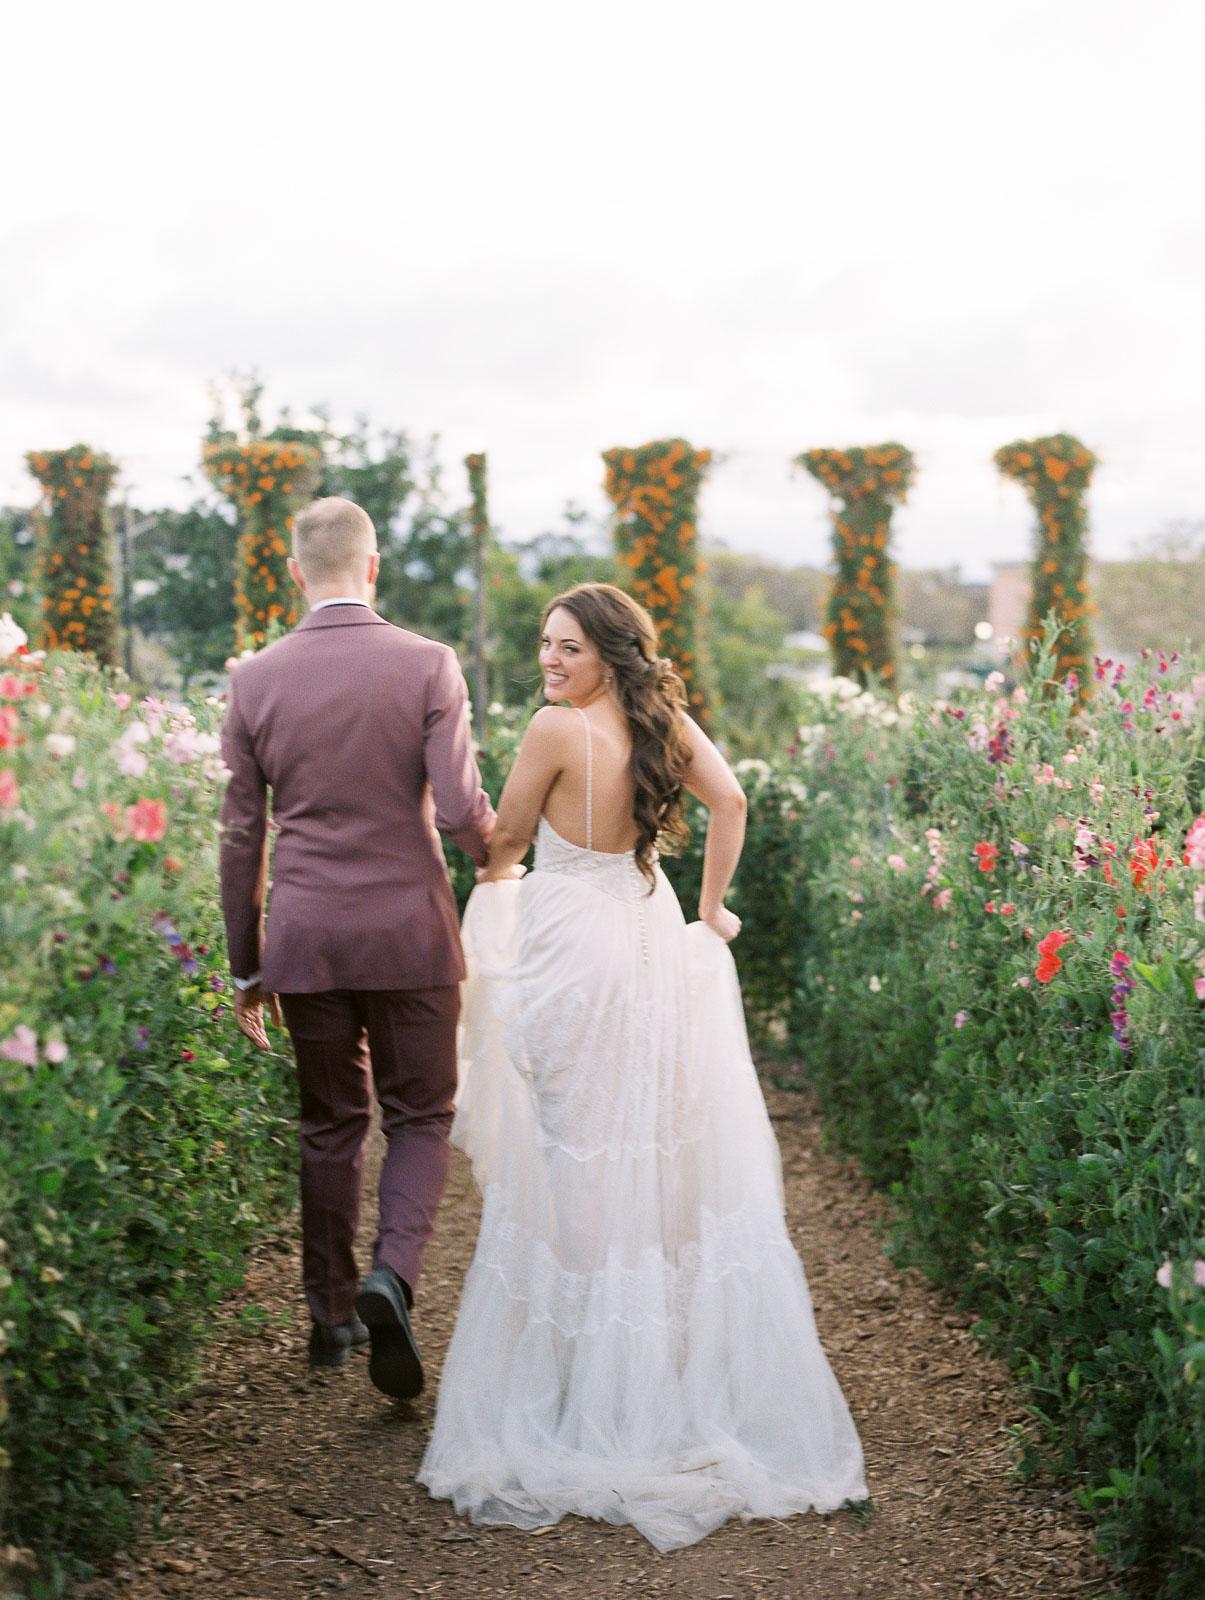 bride and groom walking through garden bride looking back smiling